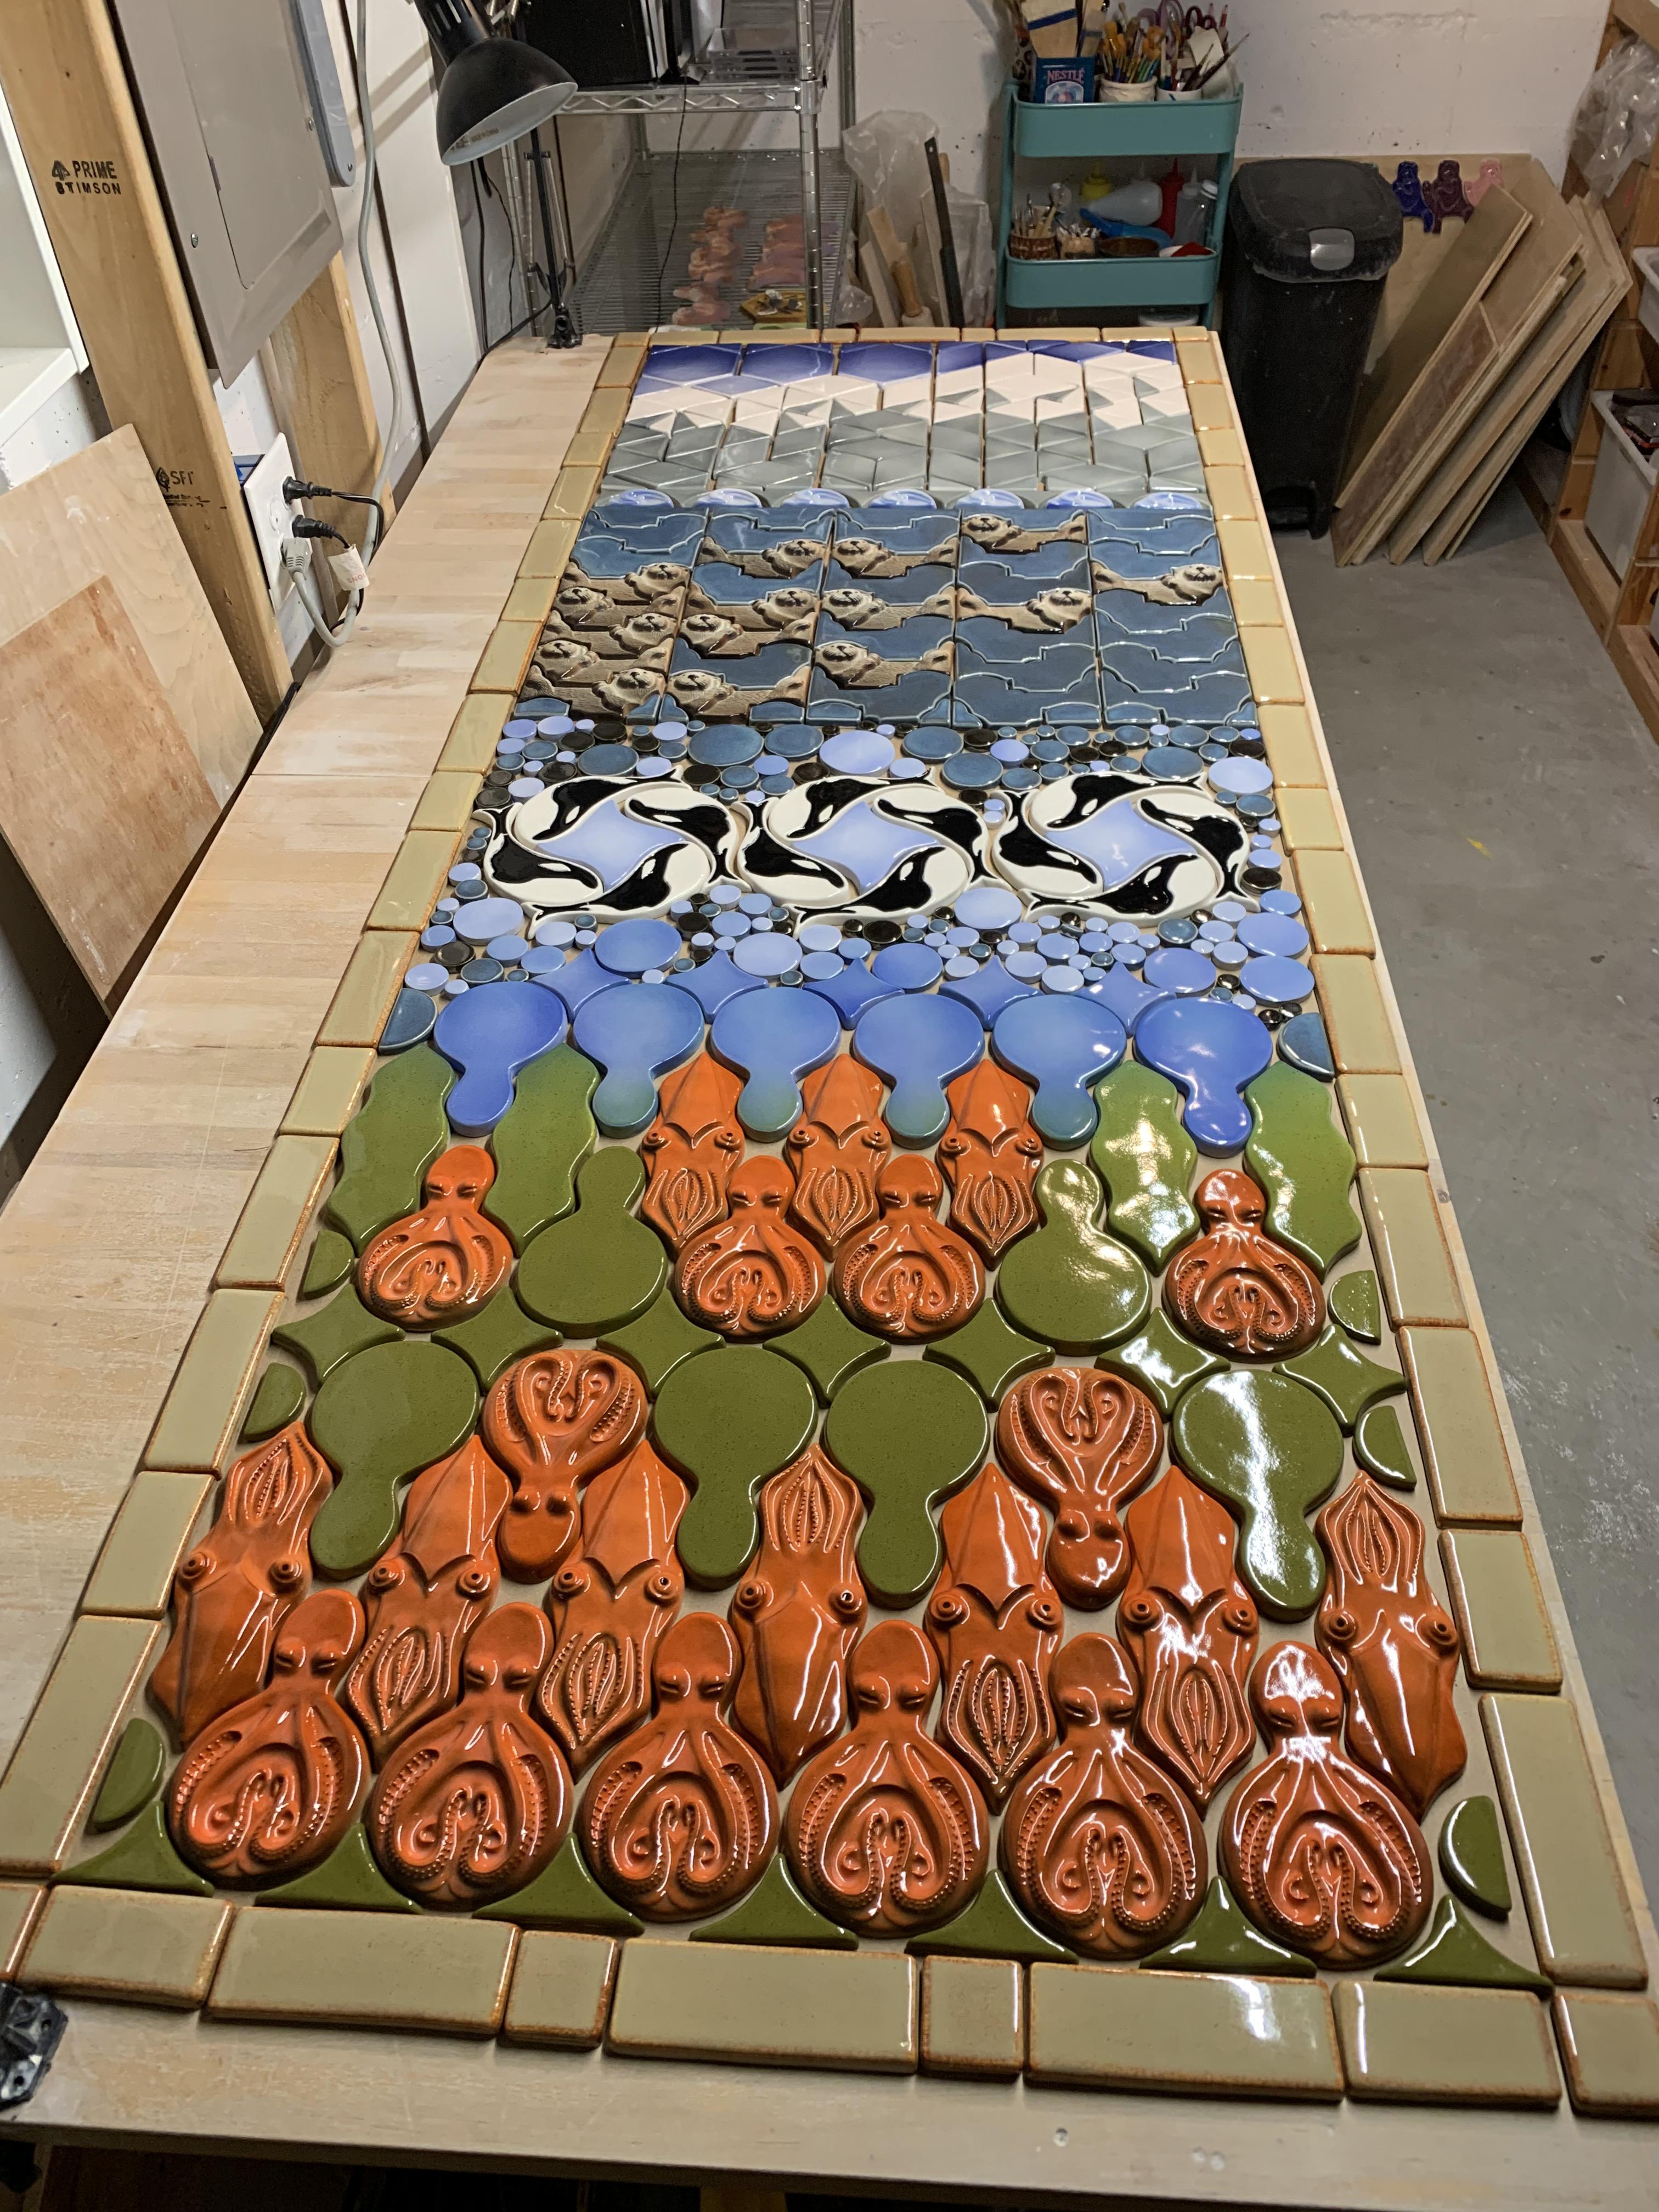 installing a ceramic tile mural 8